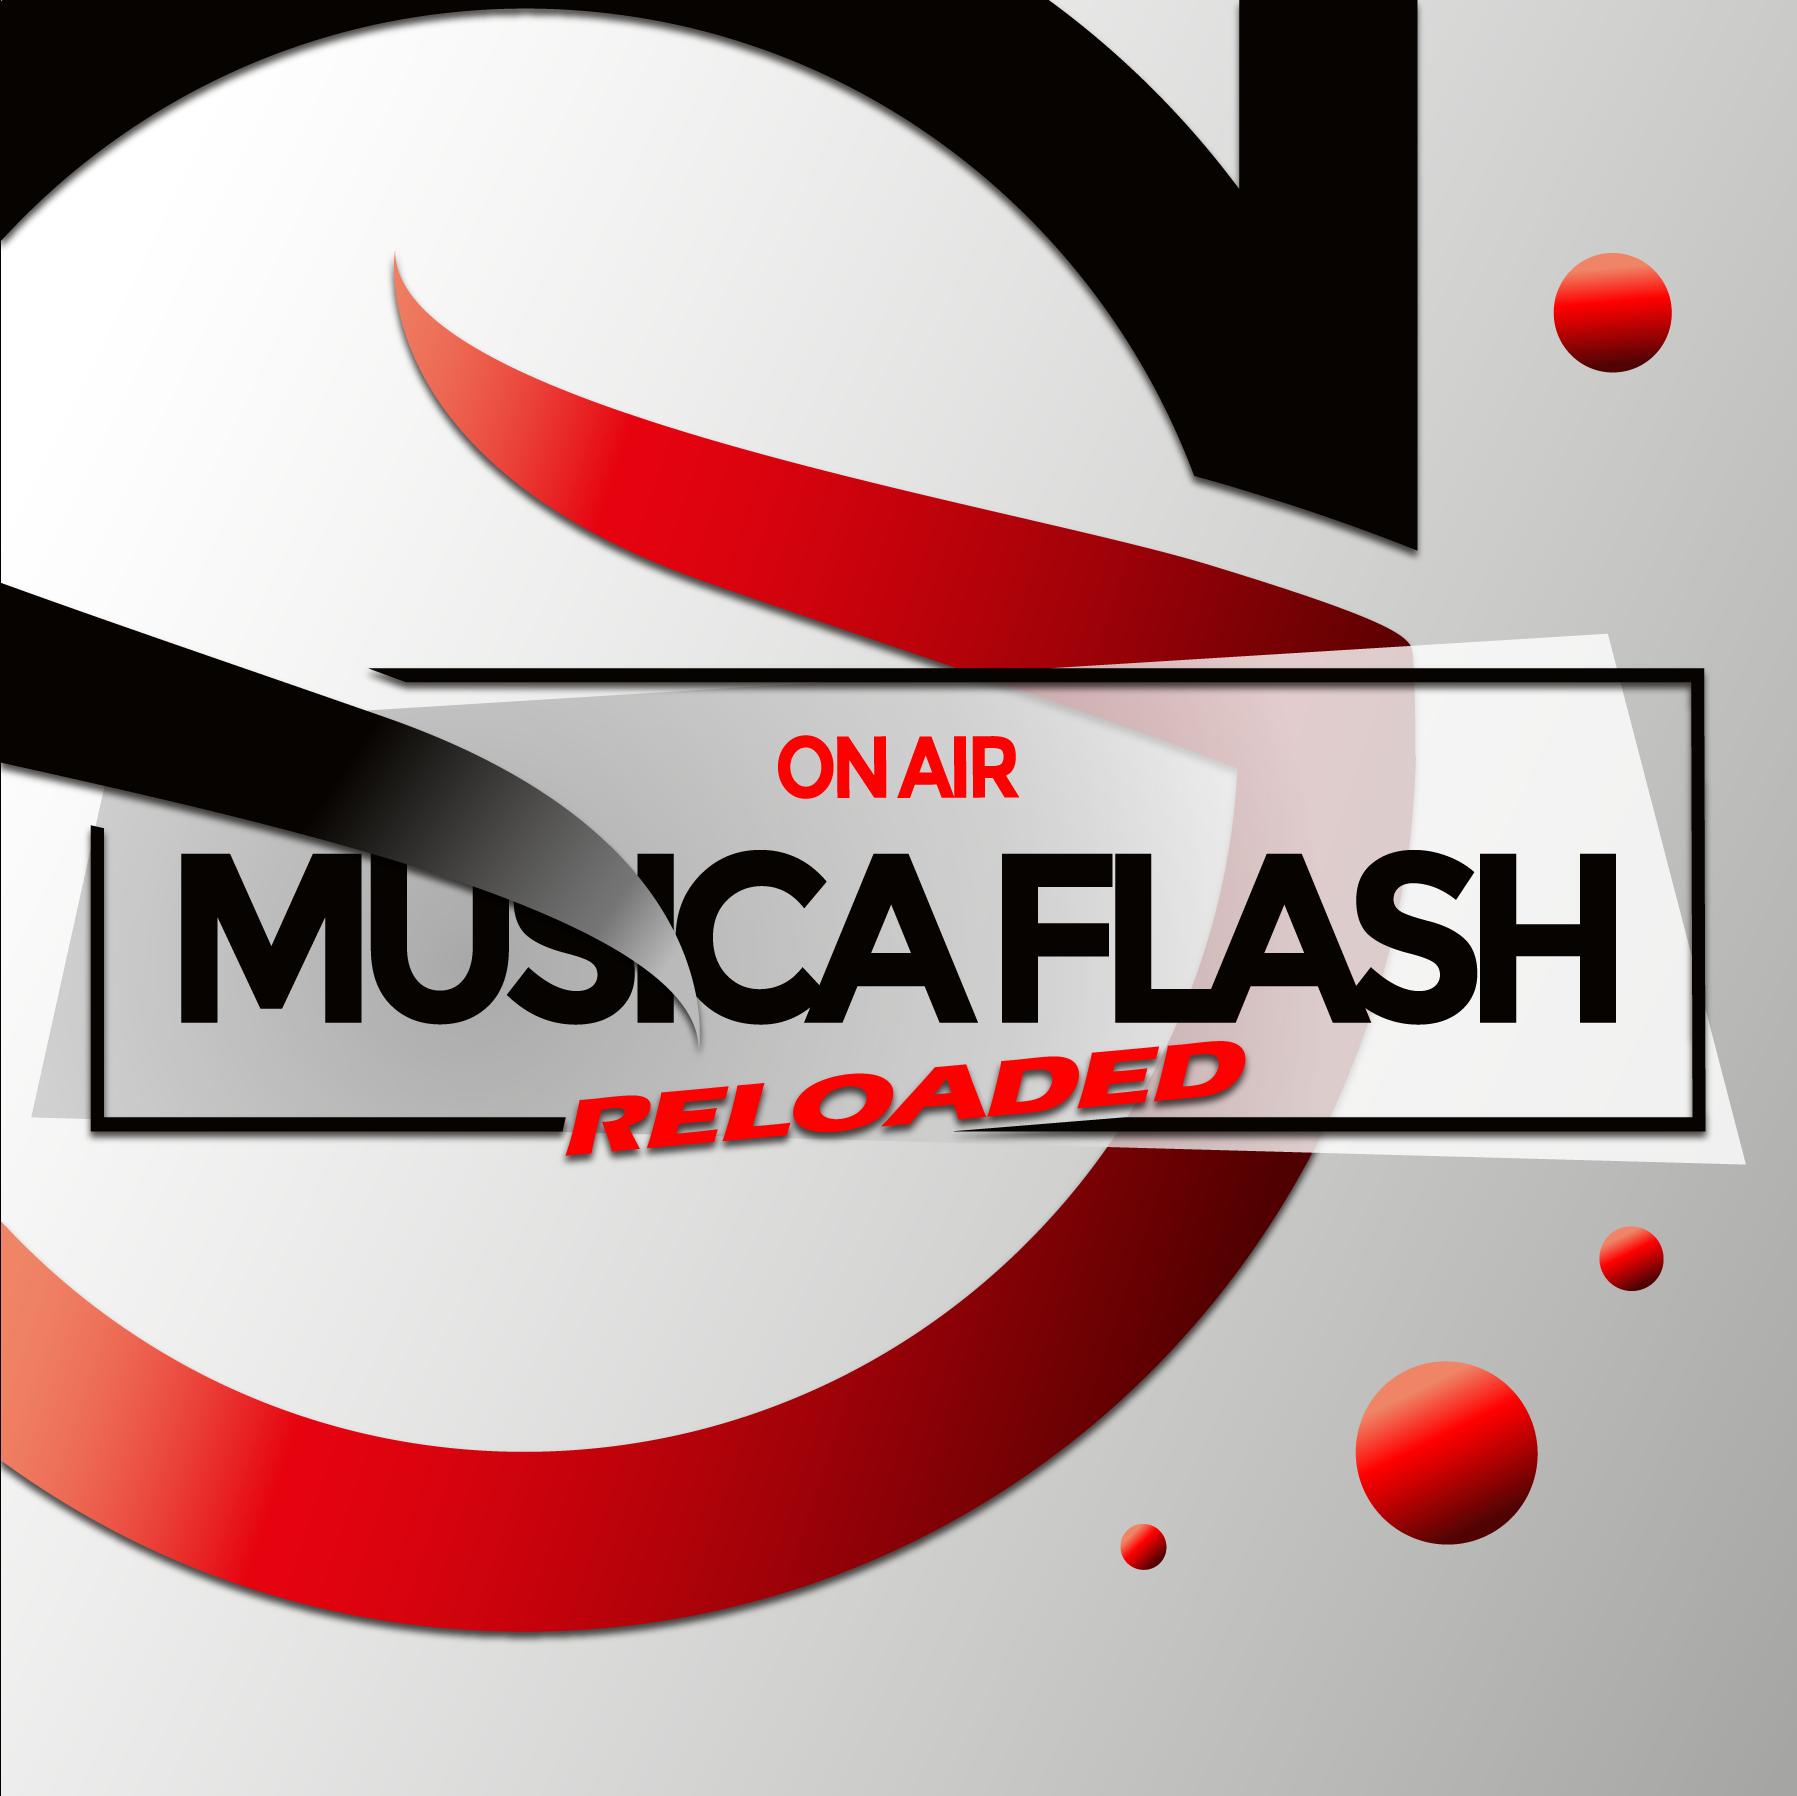 Musica Flash Reloaded